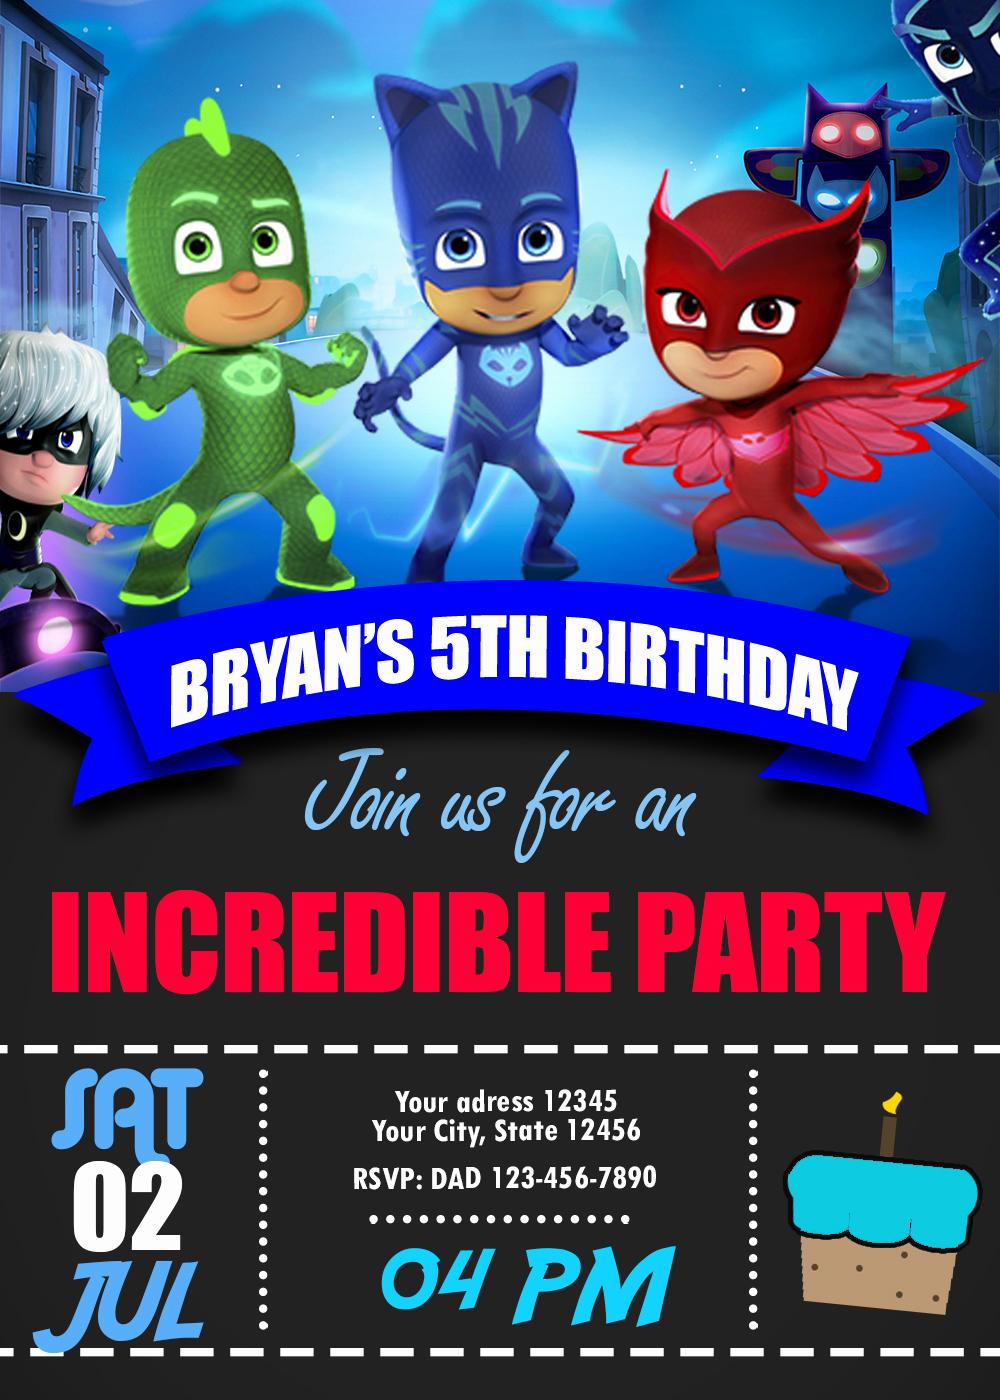 Pj Mask Invitation Free Luxury Blue Catboy Pj Masks Birthday Invitation Oscarsitosroom